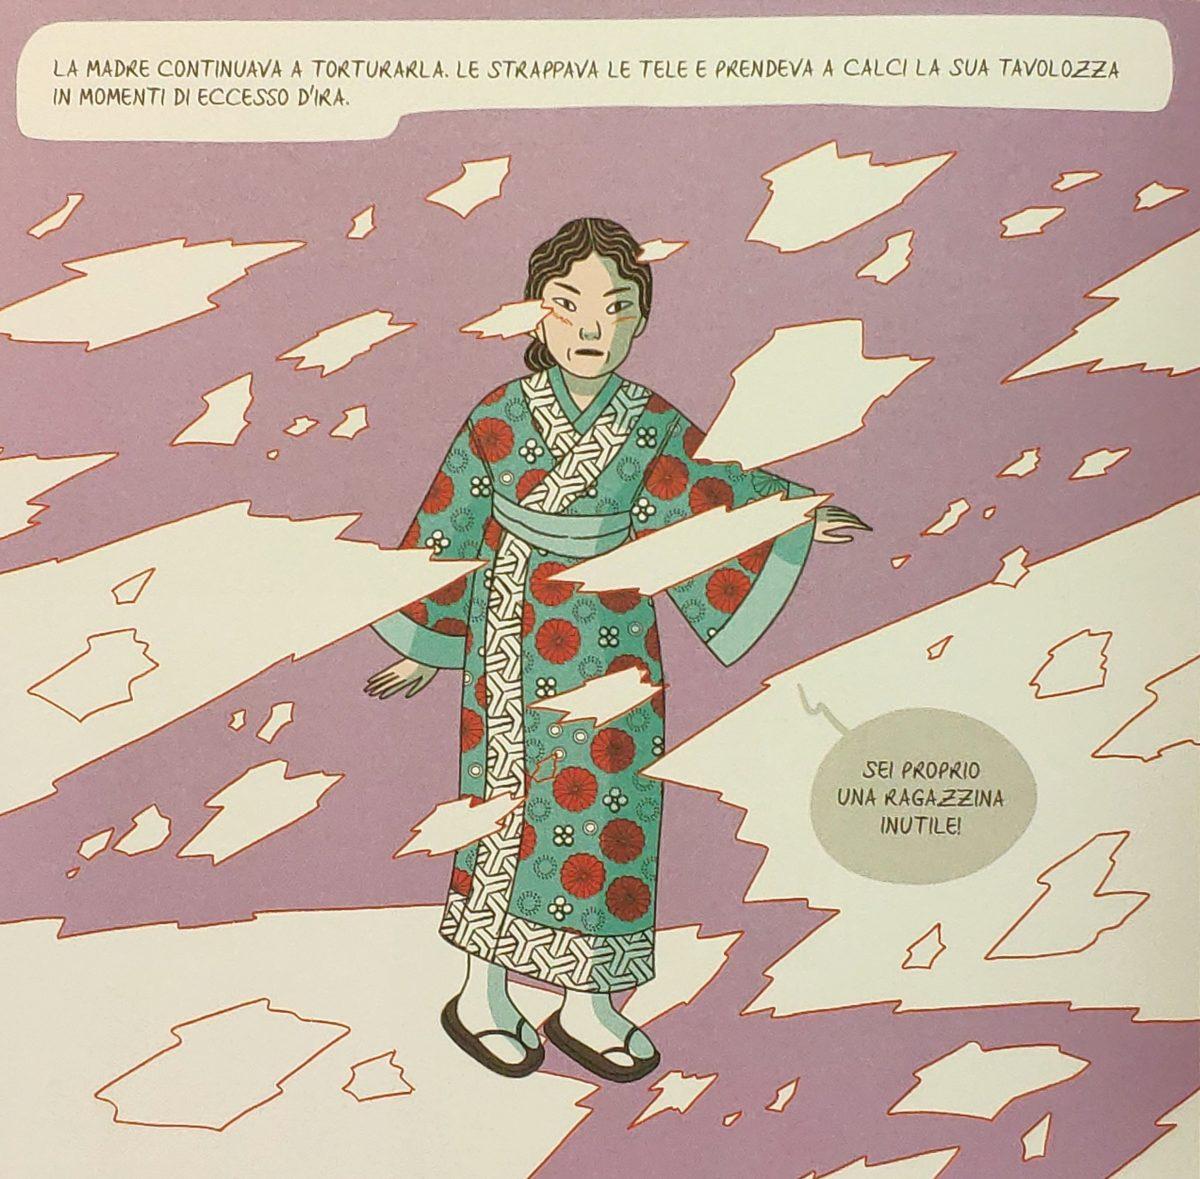 Mio caro fumetto... - La madre di Yayoi Kusama